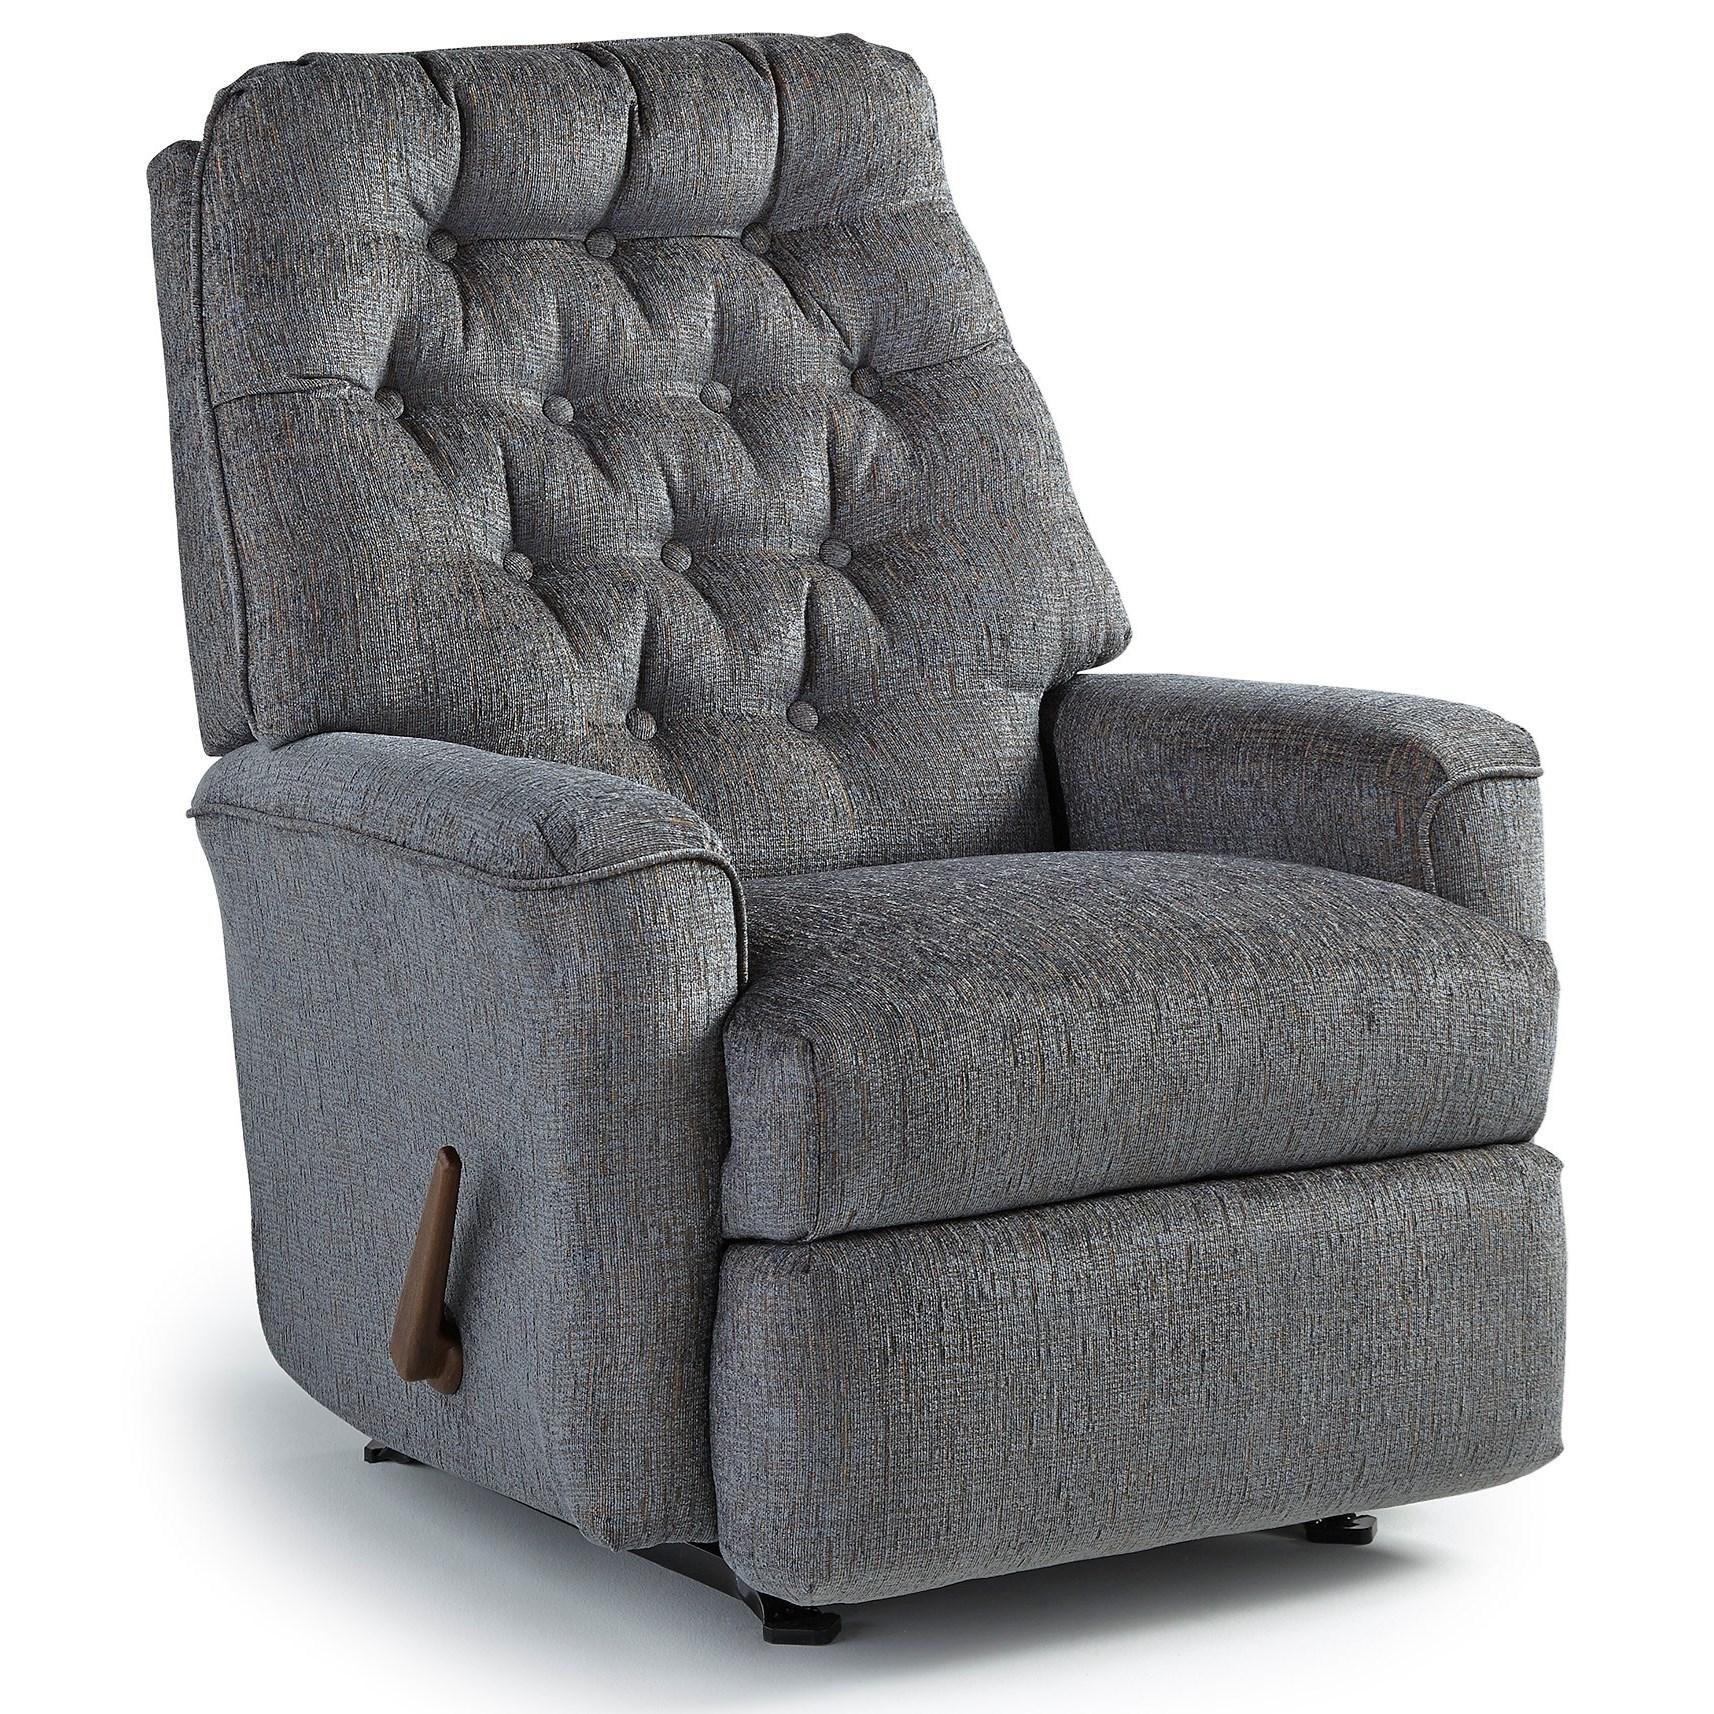 Mexi Rocking Reclining Chair